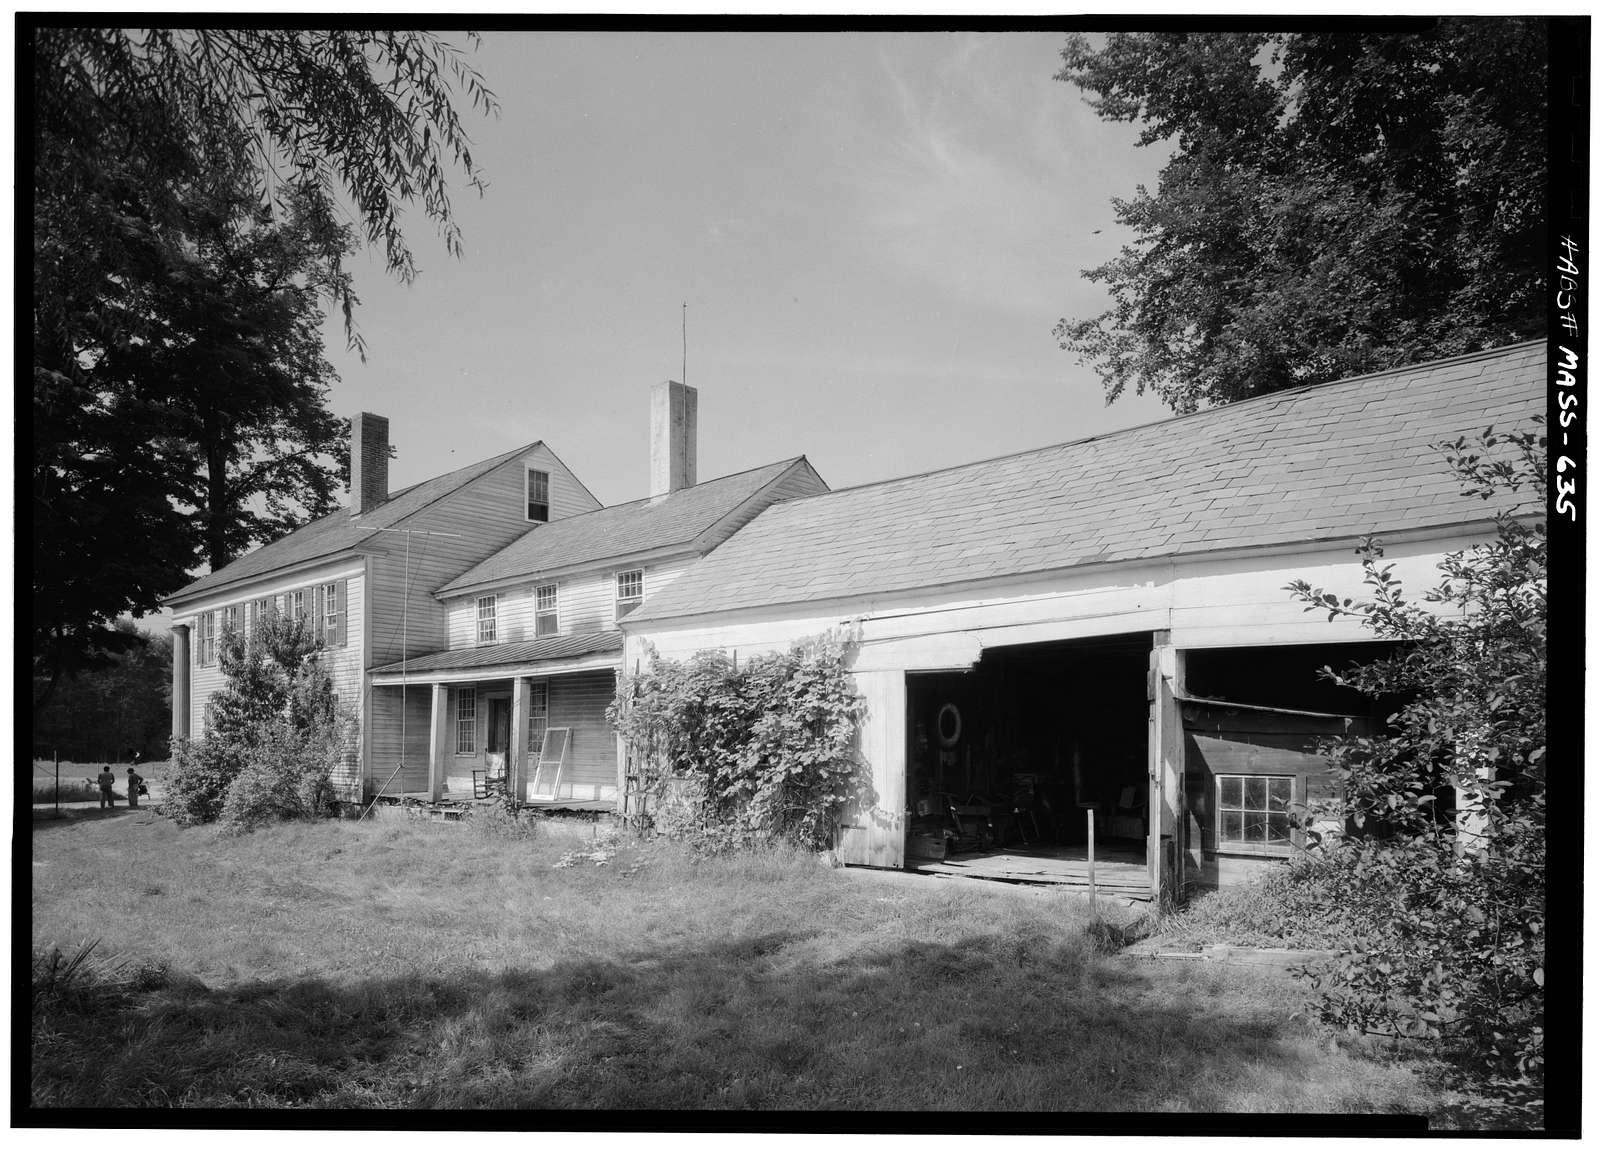 Elijah E. Belding House, Mount Hermon Station Road, West Northfield, Franklin County, MA